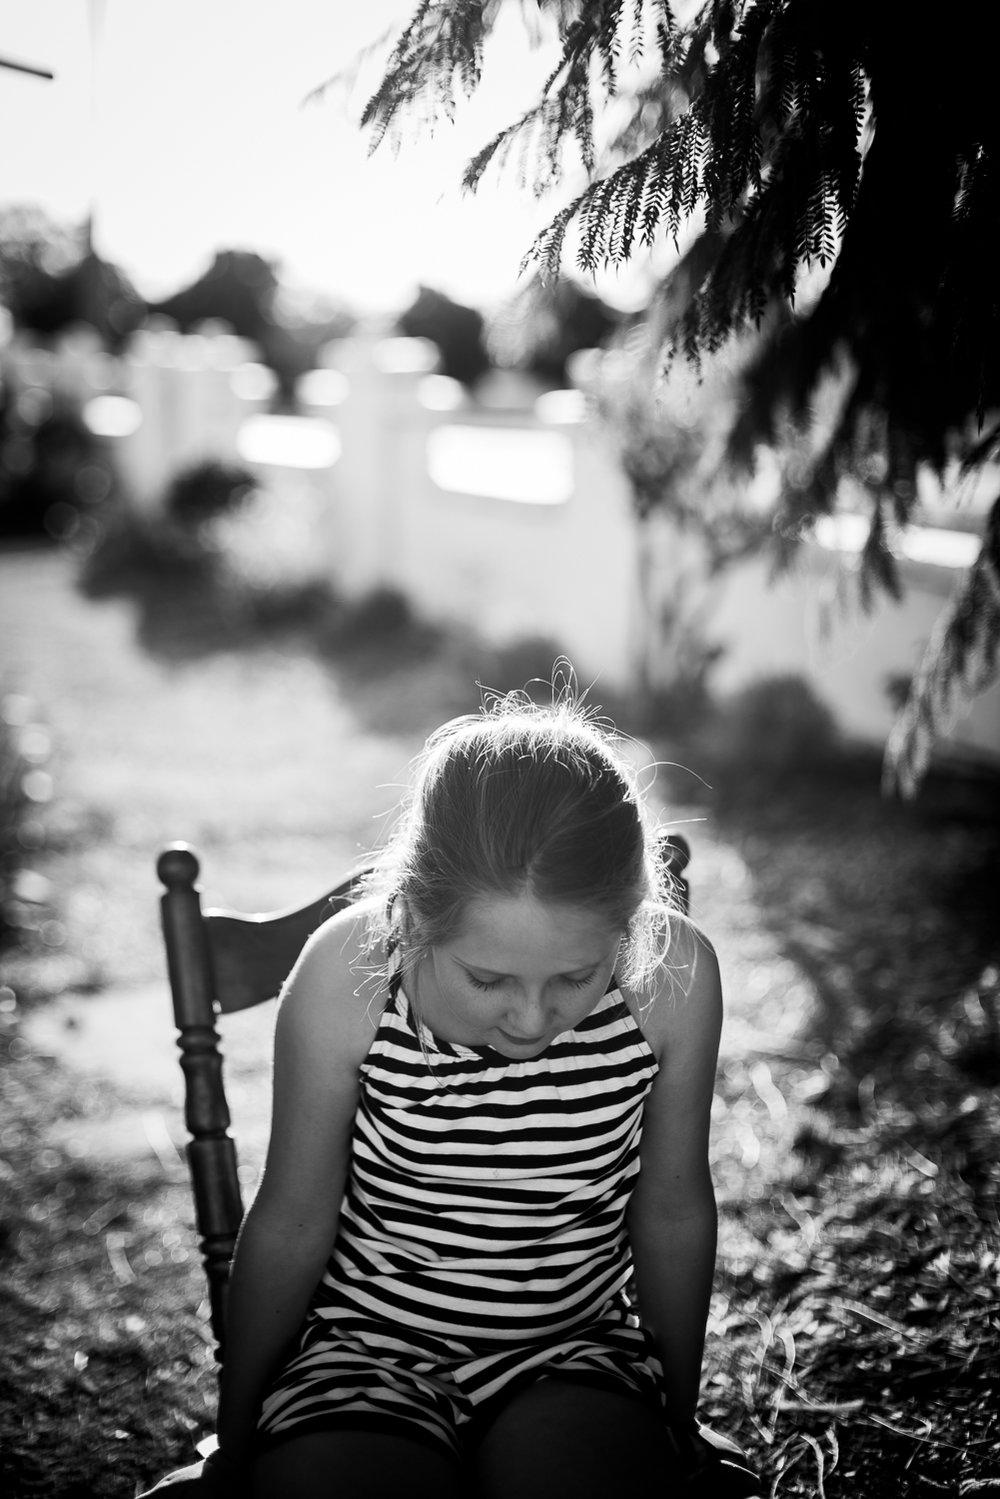 cindycavanagh-sydneyphotographer-longgrass (39 of 47).JPG